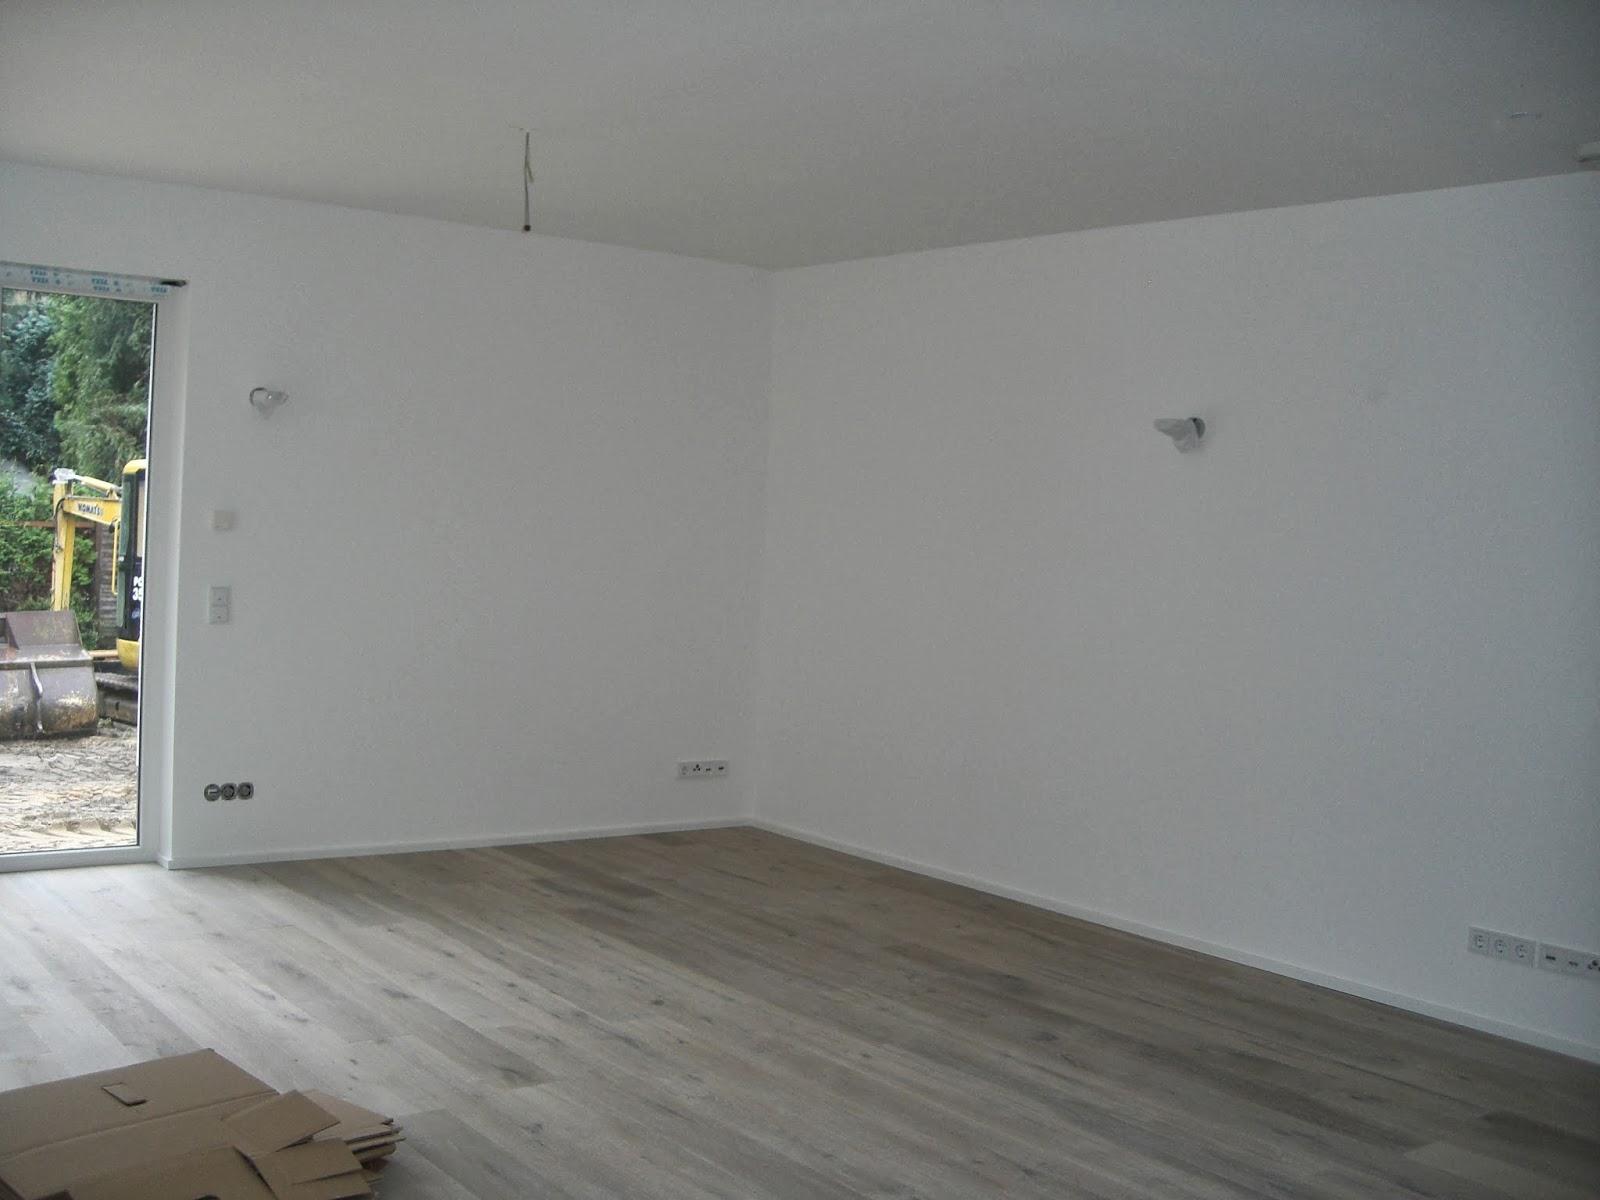 baubericht dachstrift november 2013. Black Bedroom Furniture Sets. Home Design Ideas